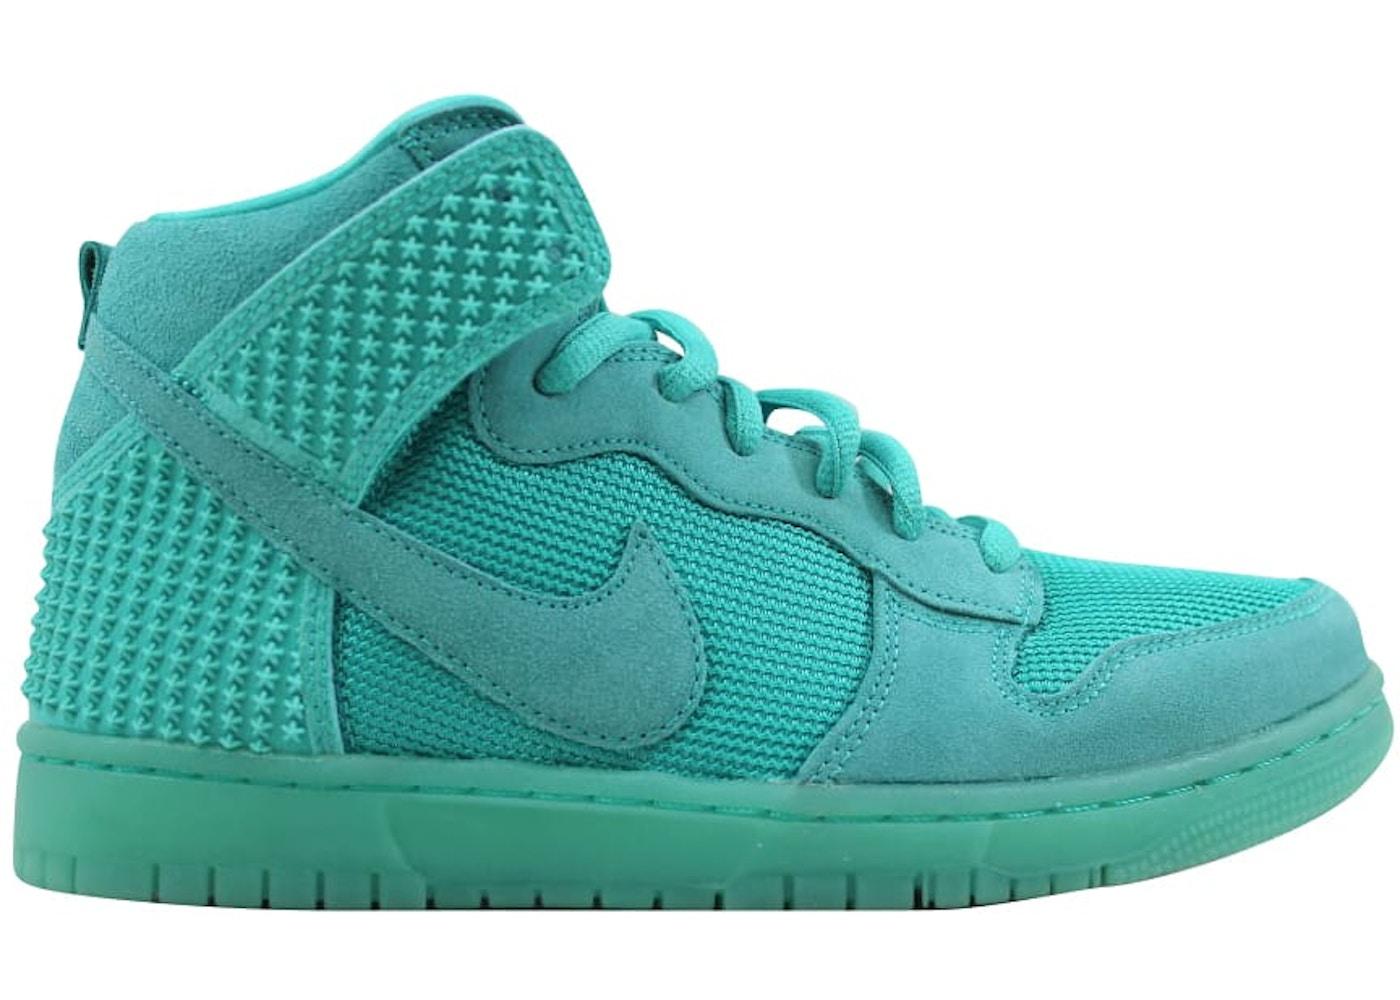 reputable site cdd41 22834 Nike Dunk CMFT Premium Light Retro